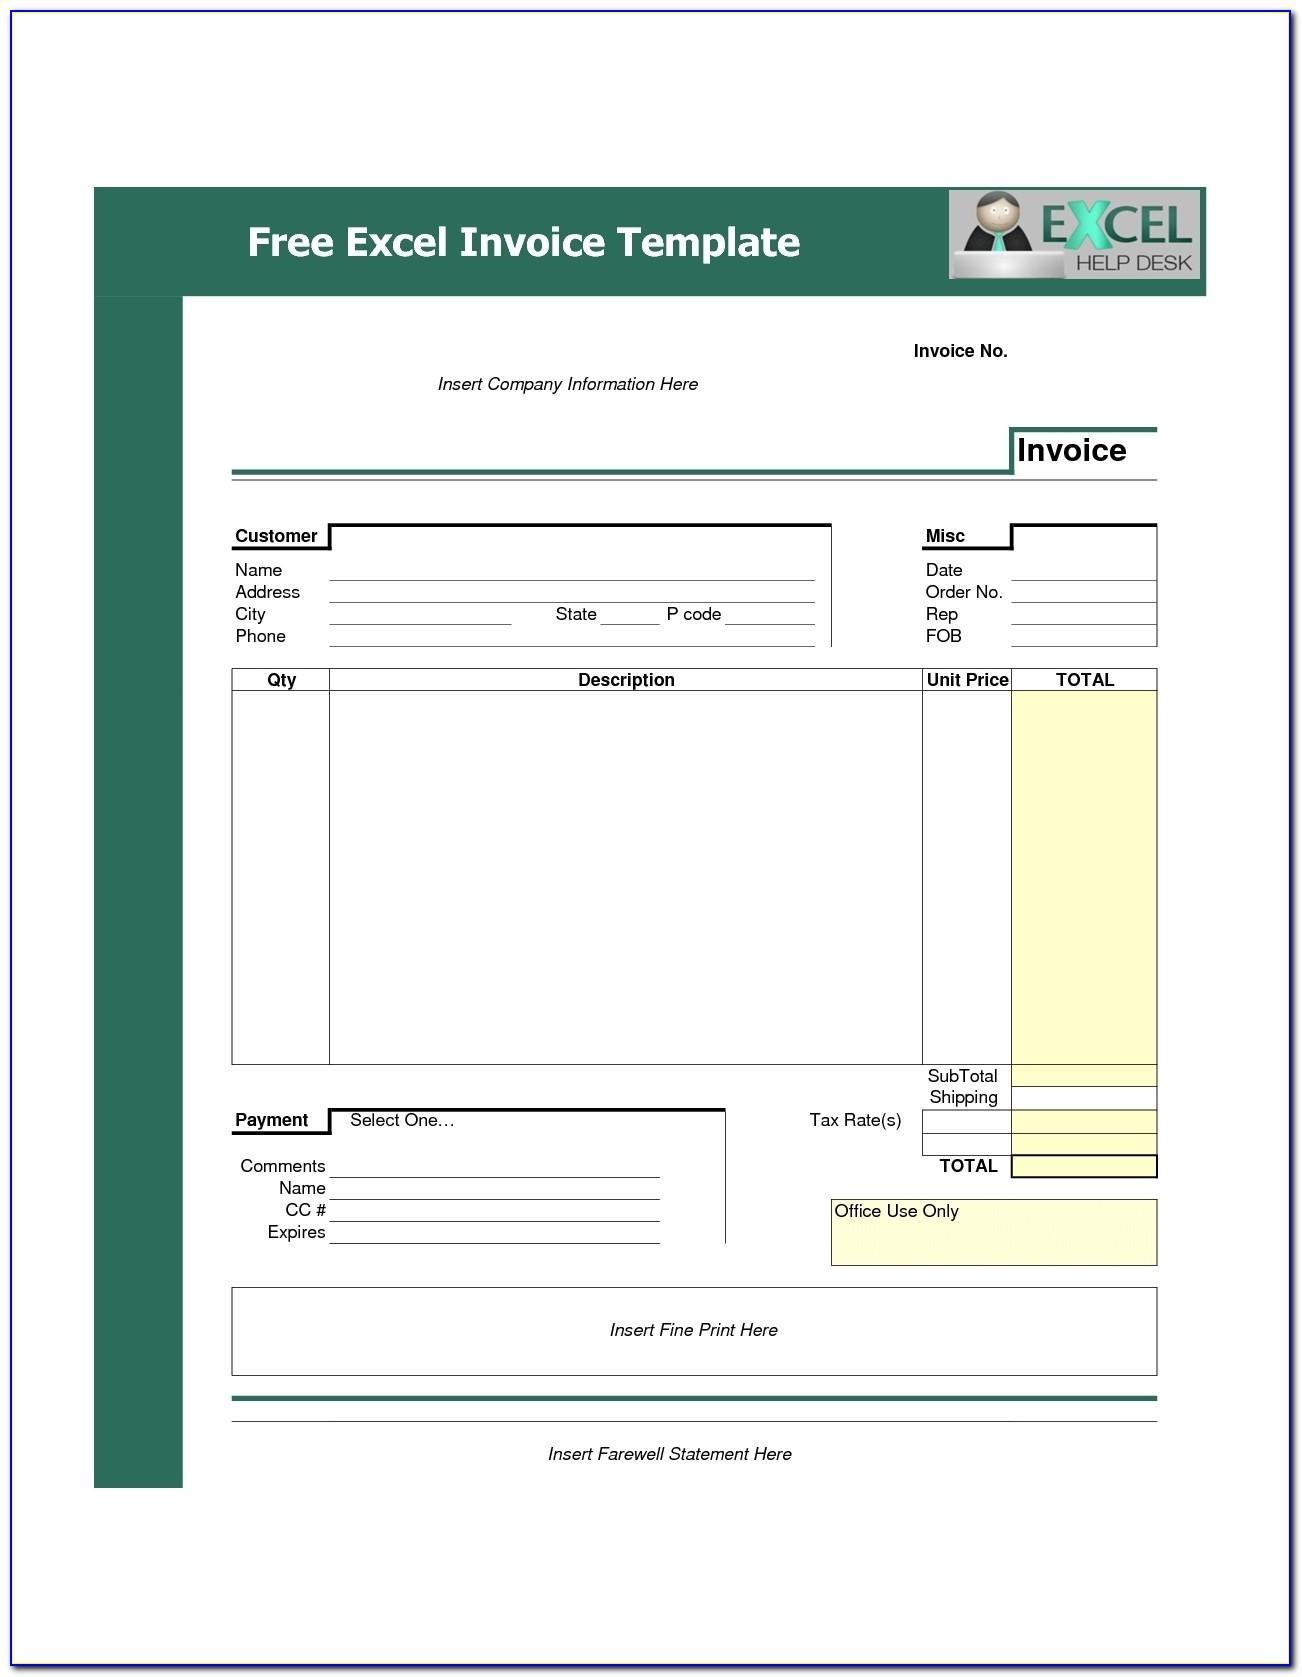 Proforma Invoice Template Free Excel